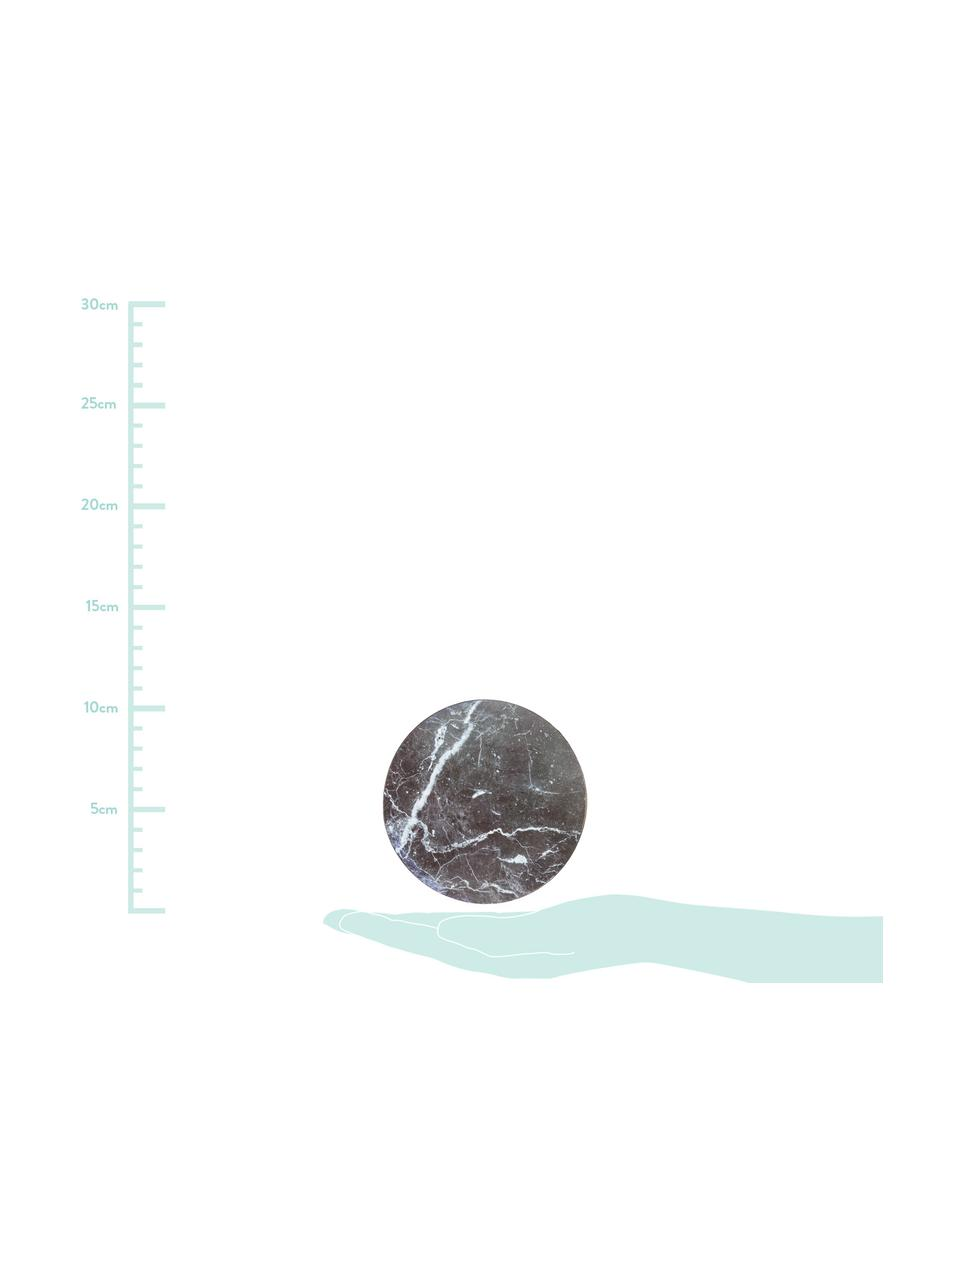 Kork-Untersetzer Cara in Marmoroptik, 6er-Set, Kork, beschichtet, Marmor-Optik, Ø 10 cm